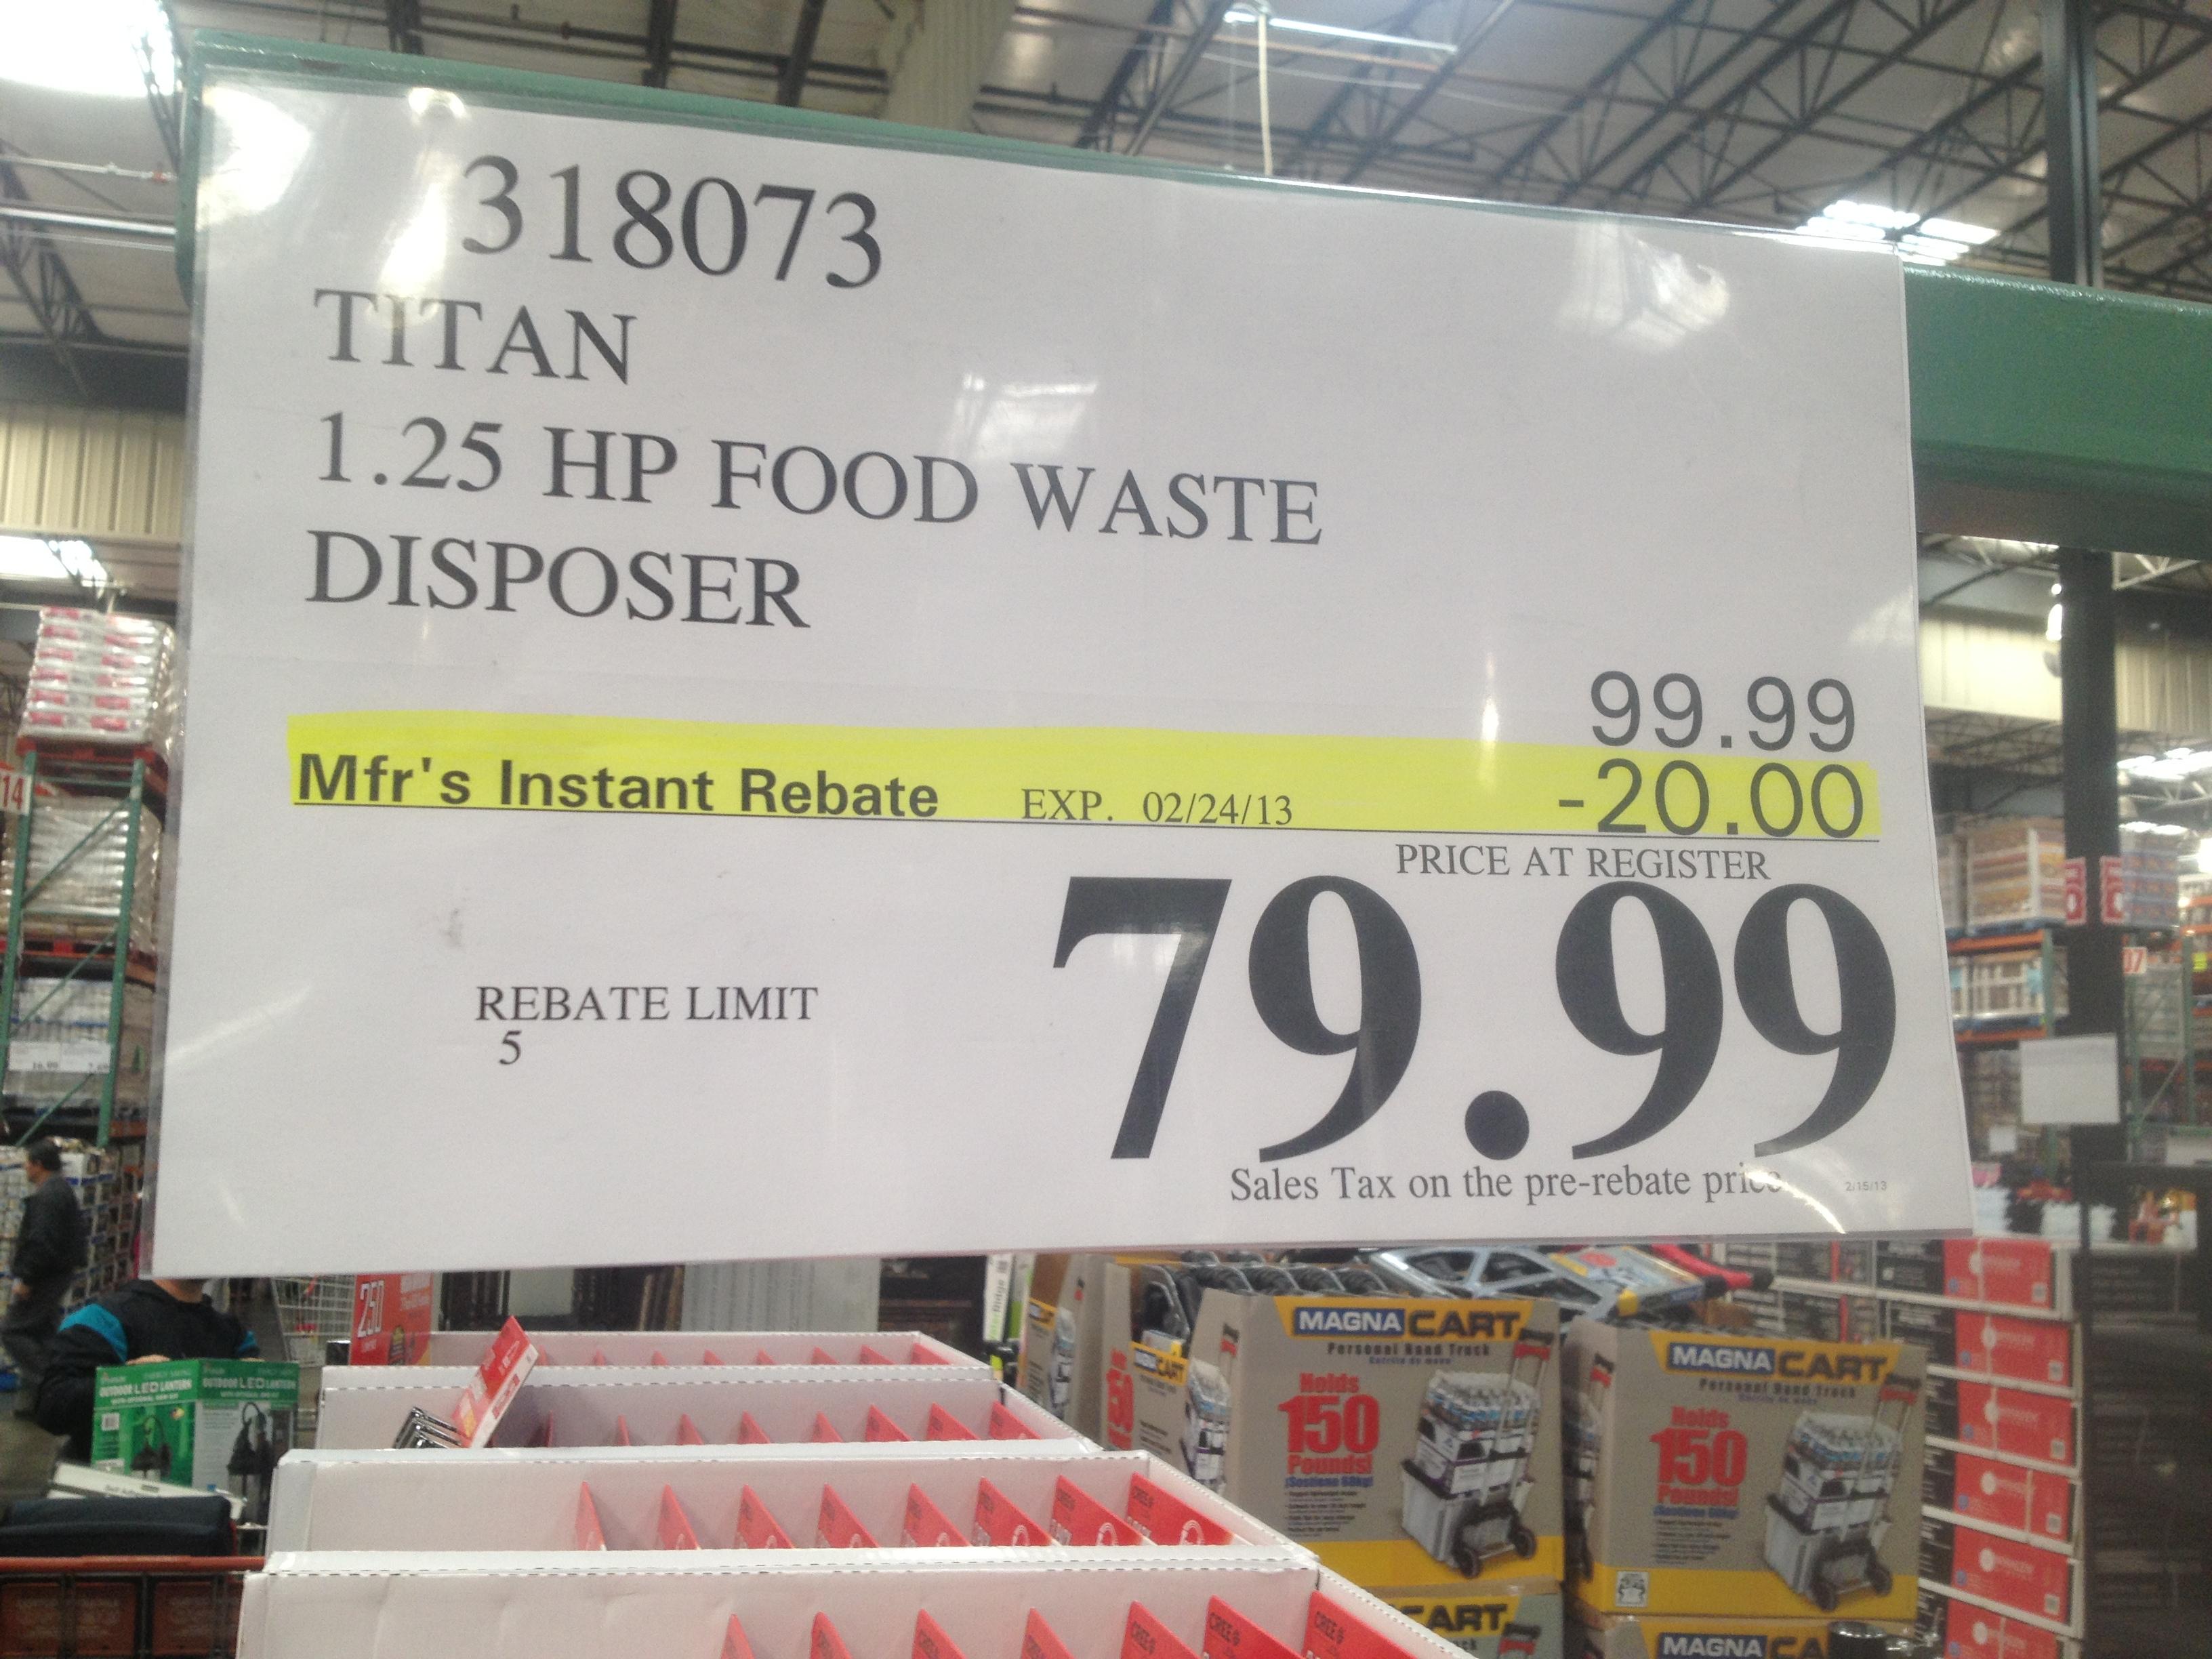 Costco - item number 318073 - Titan 1.25 HP Food Waste ... on Costco Number id=21317